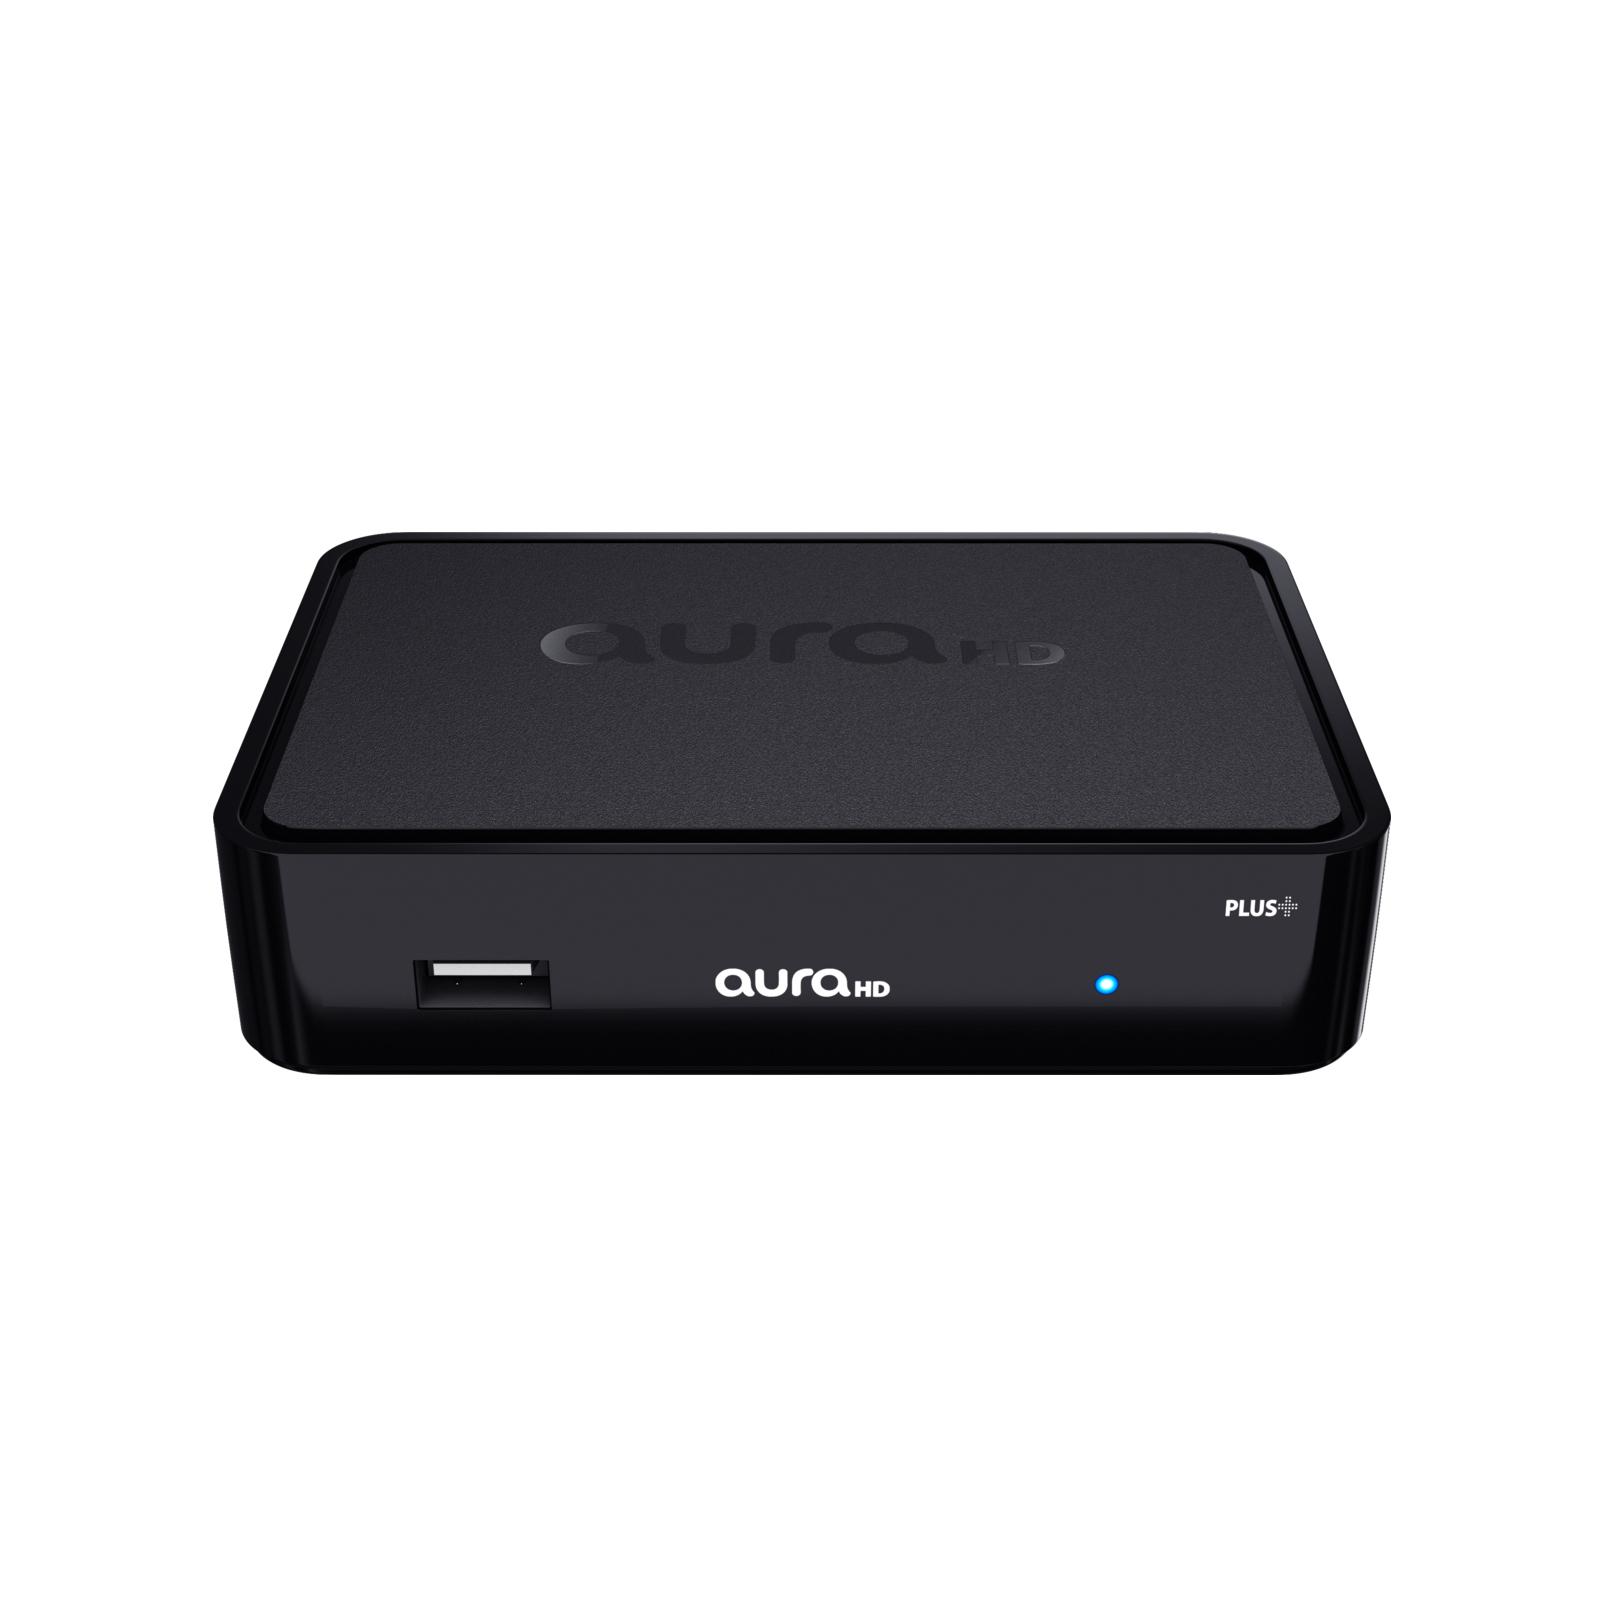 Медиаплеер Aura HD Plus WiFi T2 (Aura HD Plus WiFi T2) изображение 5